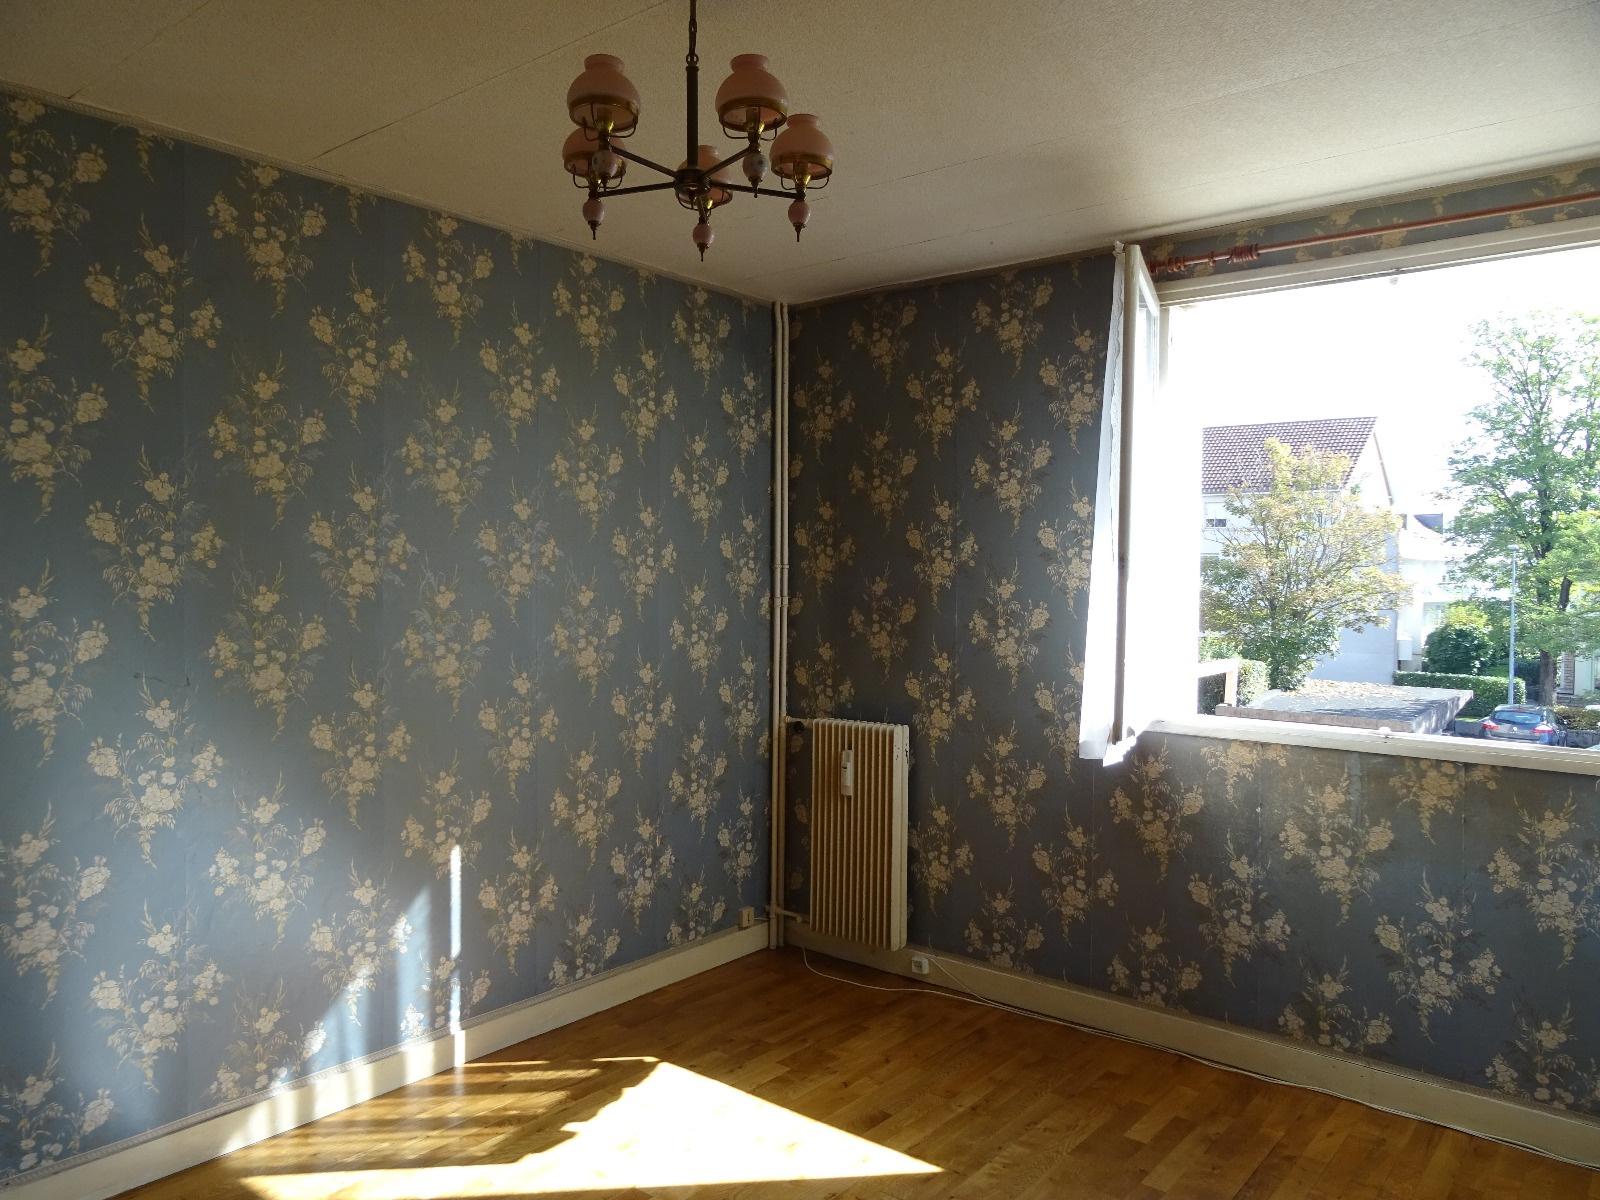 vente appartement a vendre dijon centre. Black Bedroom Furniture Sets. Home Design Ideas